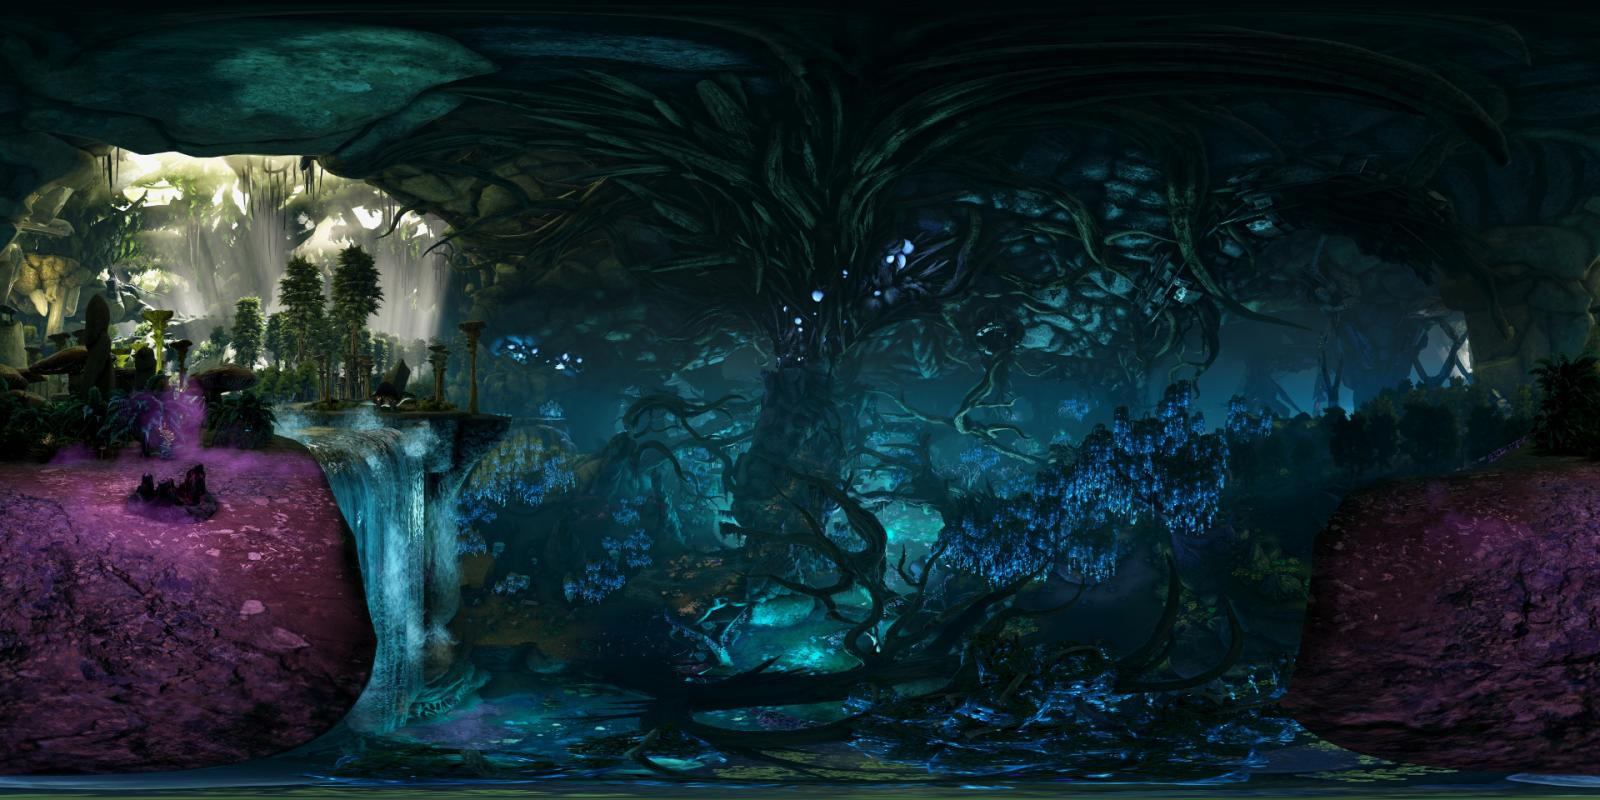 large.5a3da3eaa3fb2_WolfAngelus-MysticalBiomes-360.jpg